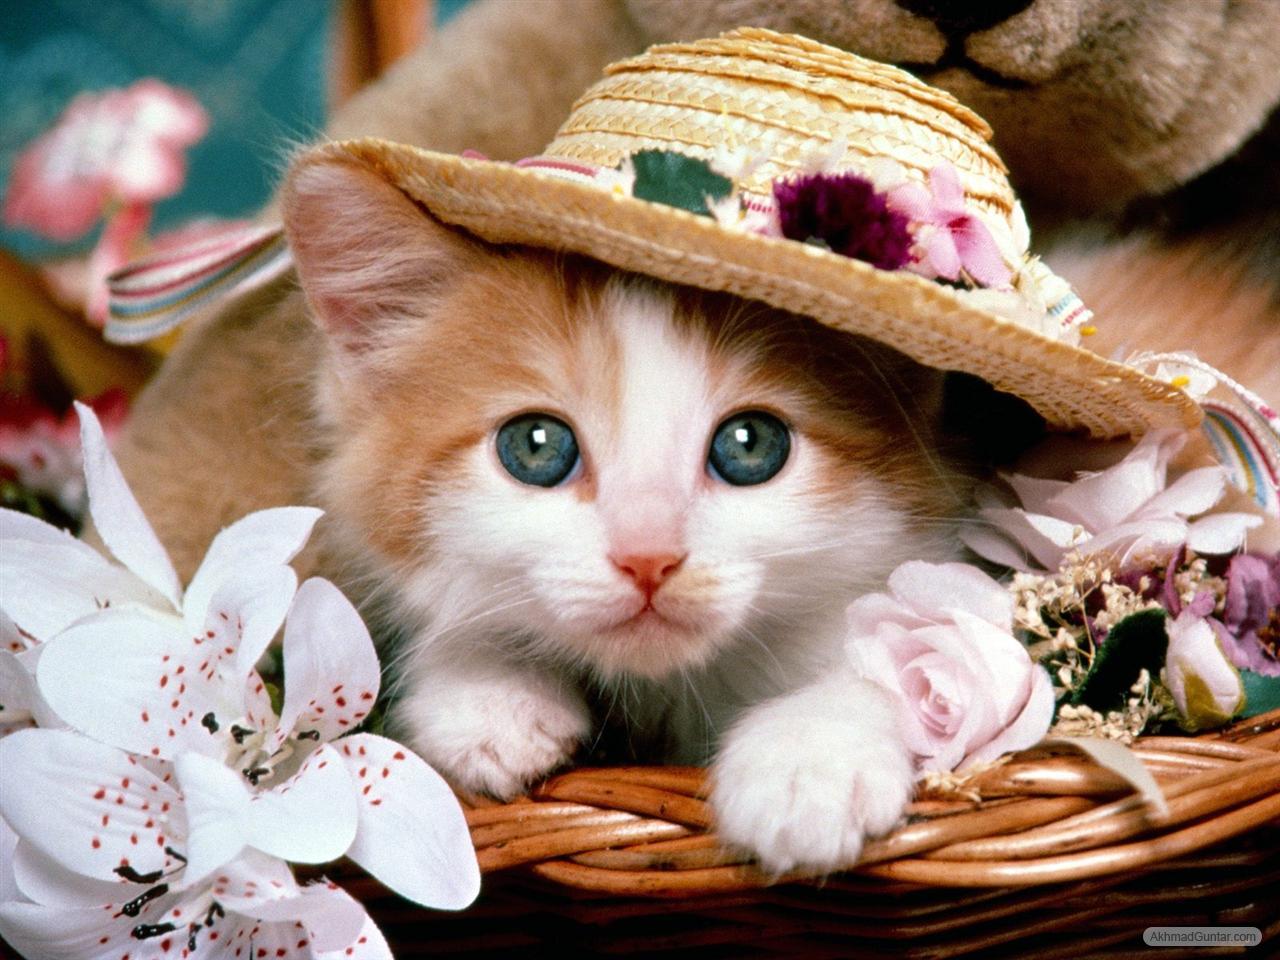 Perawatan Kucing Kucing Lucu Dan Imut